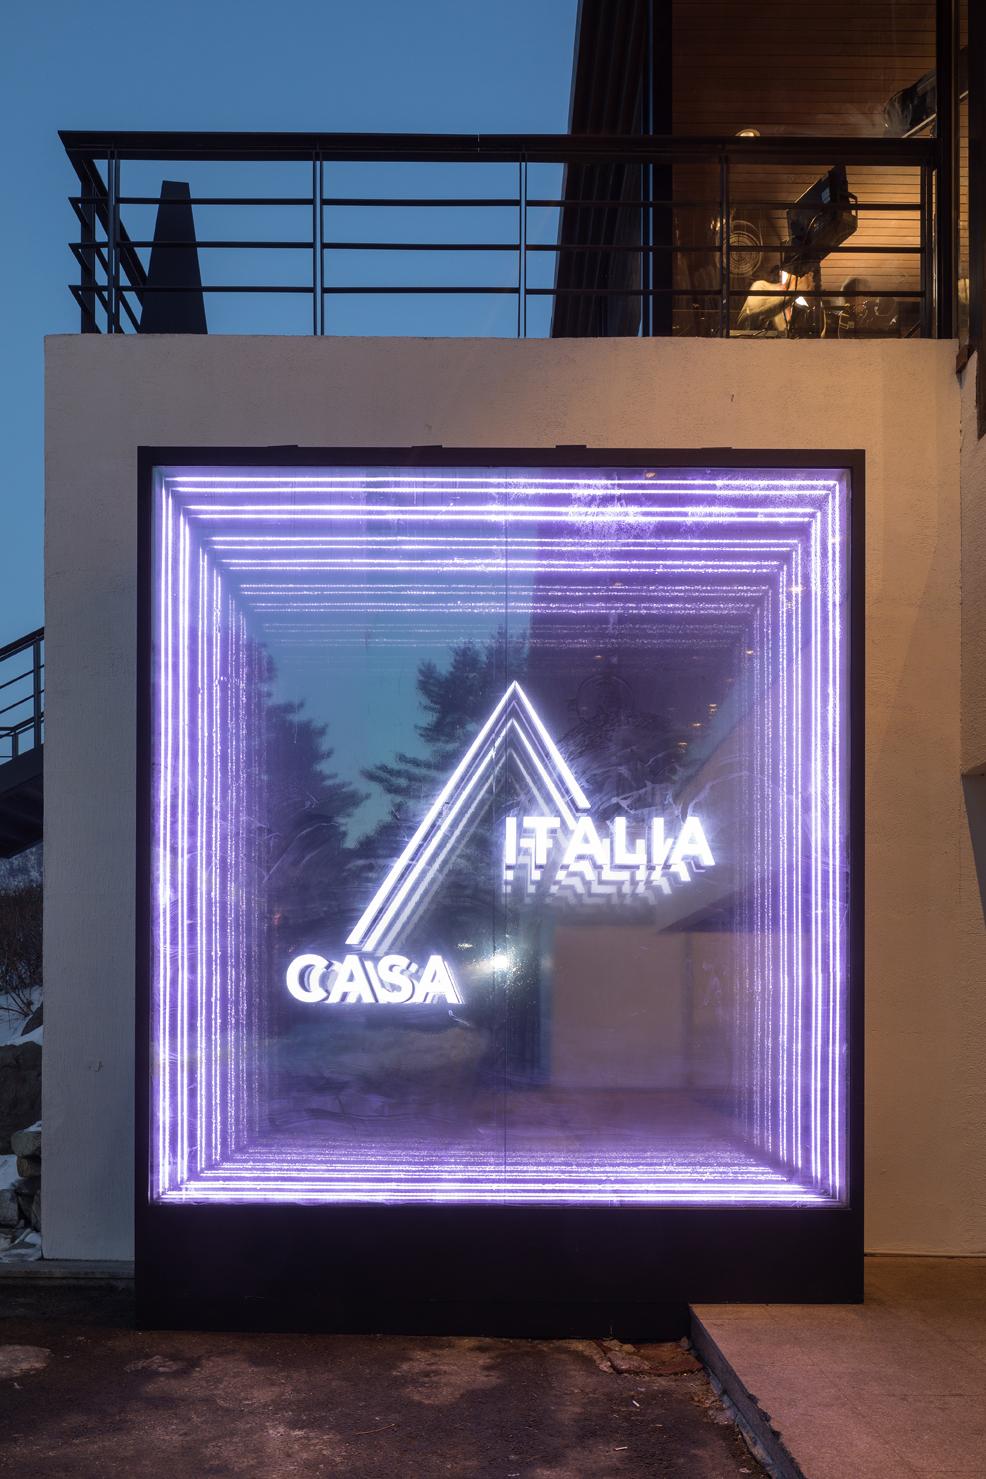 Casa italia-04(ⓒrohspace) copy